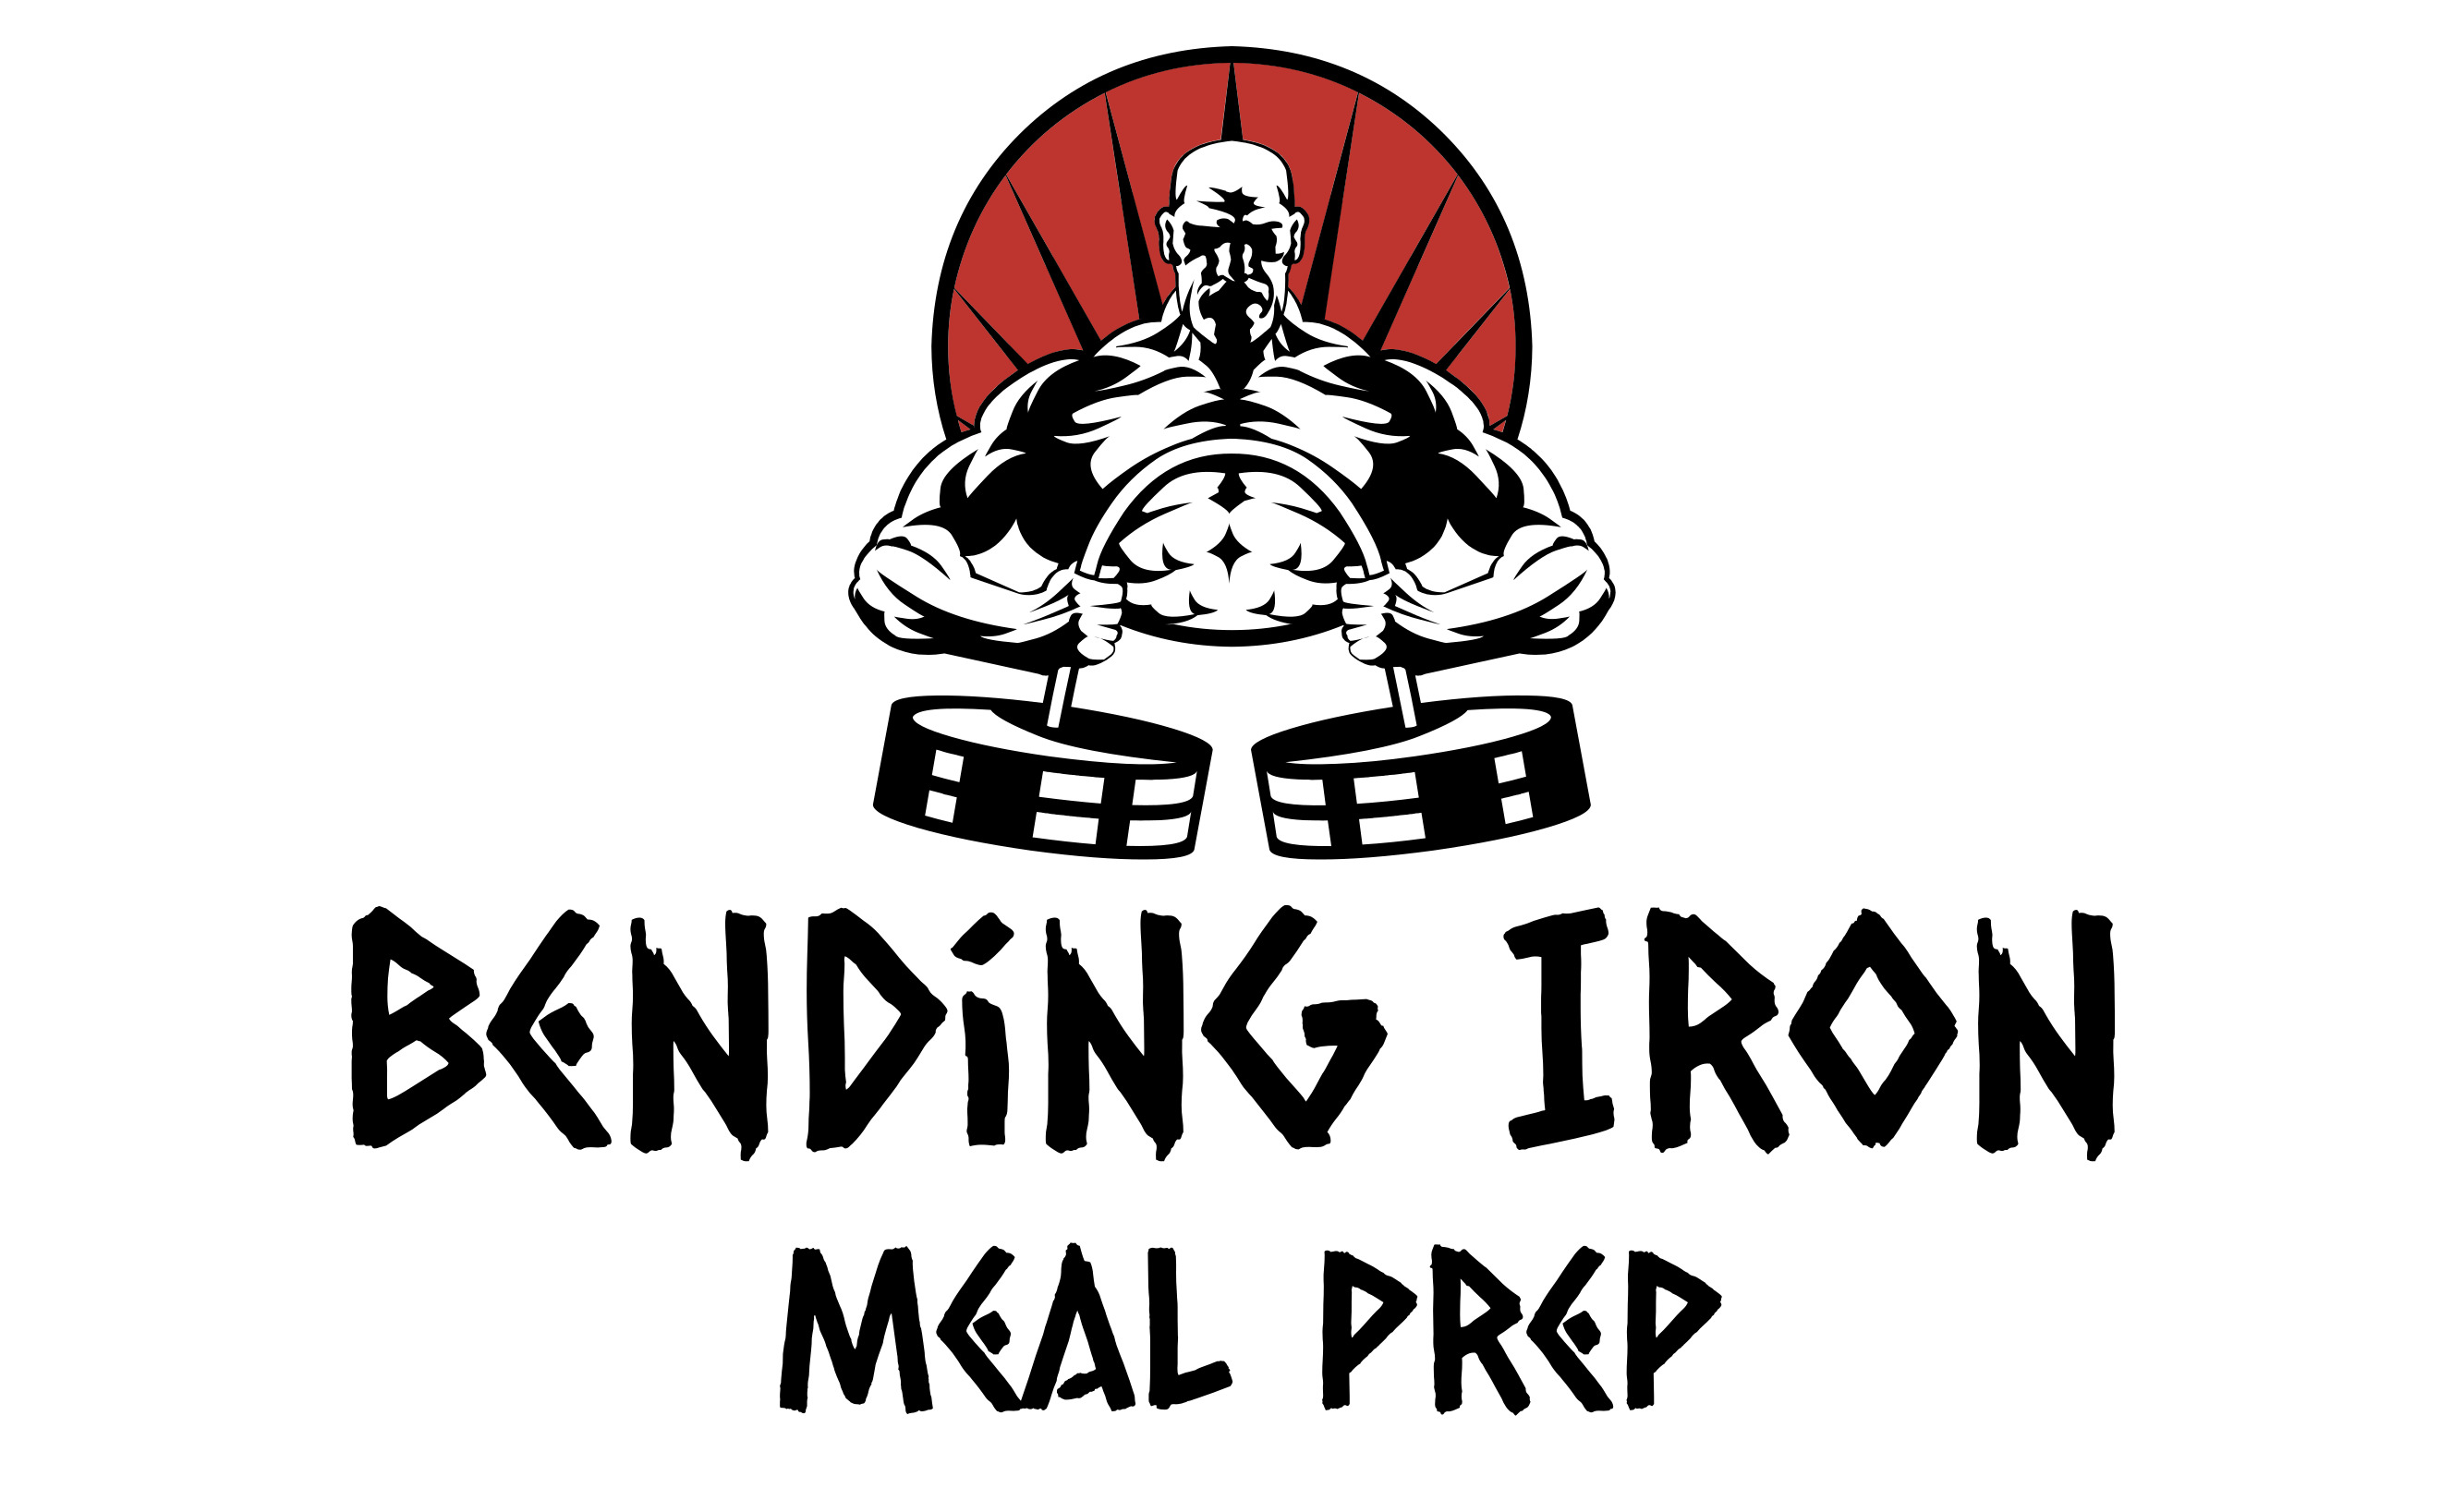 Bending Iron Meal Prep